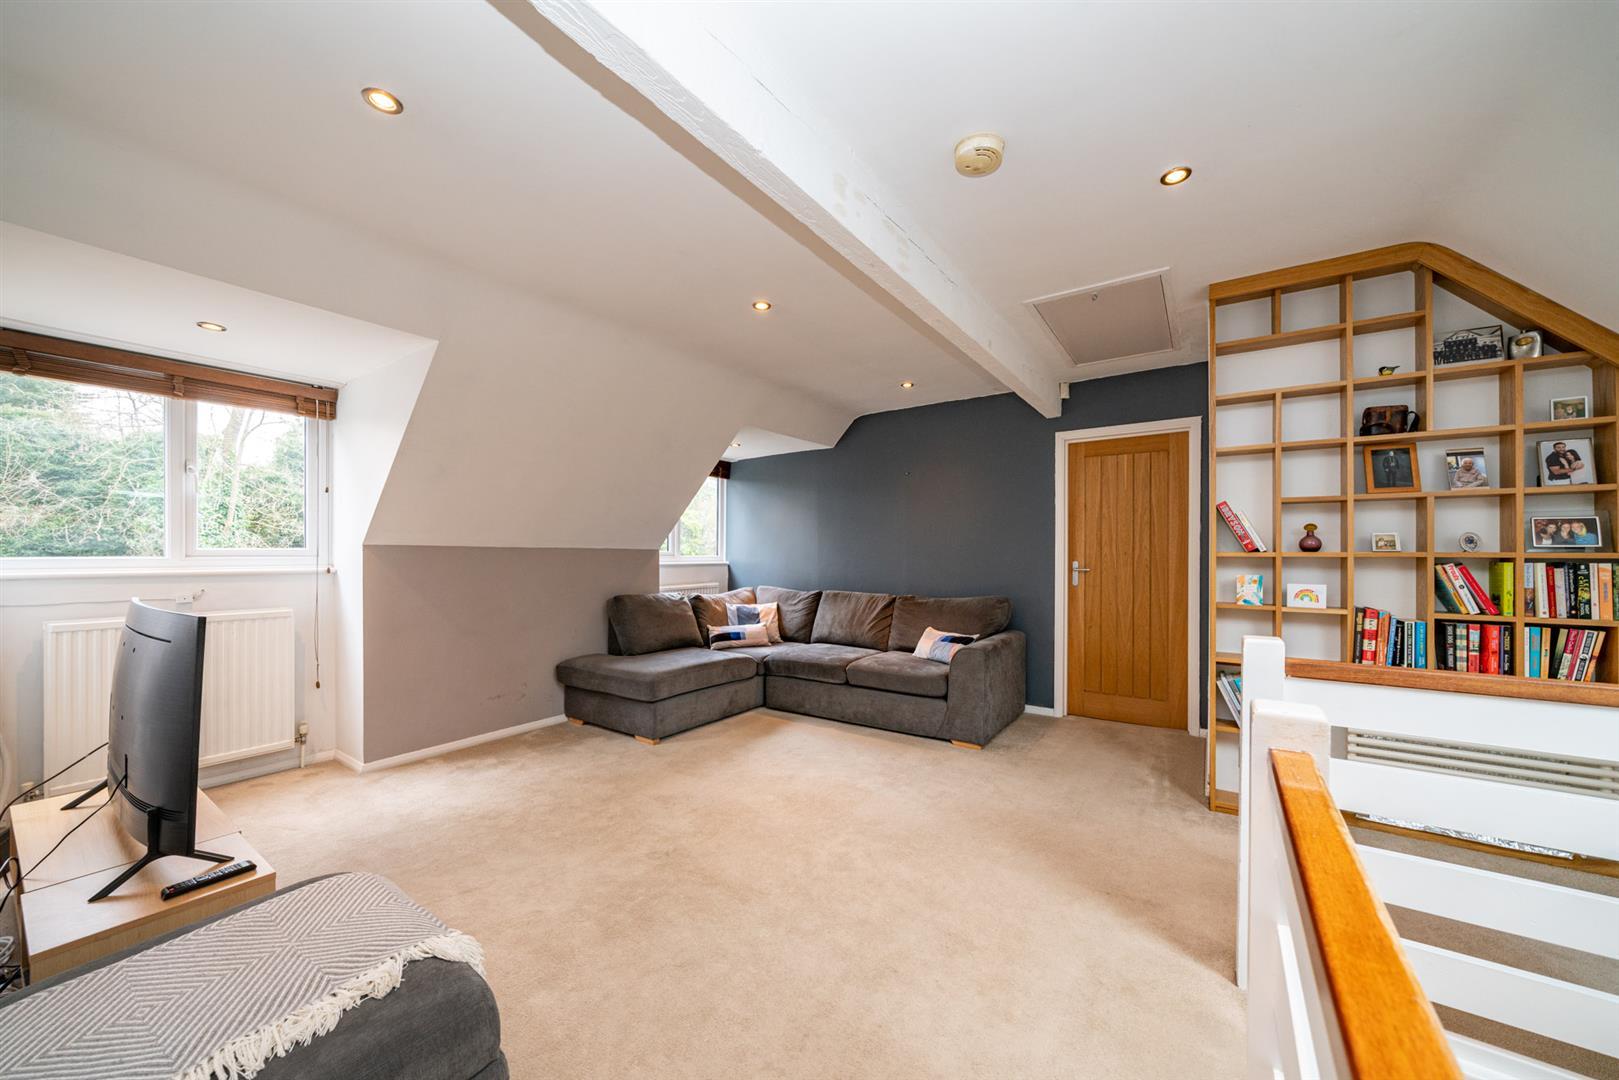 Flat-6-Ruscoe-5112 - living room 2.jpg